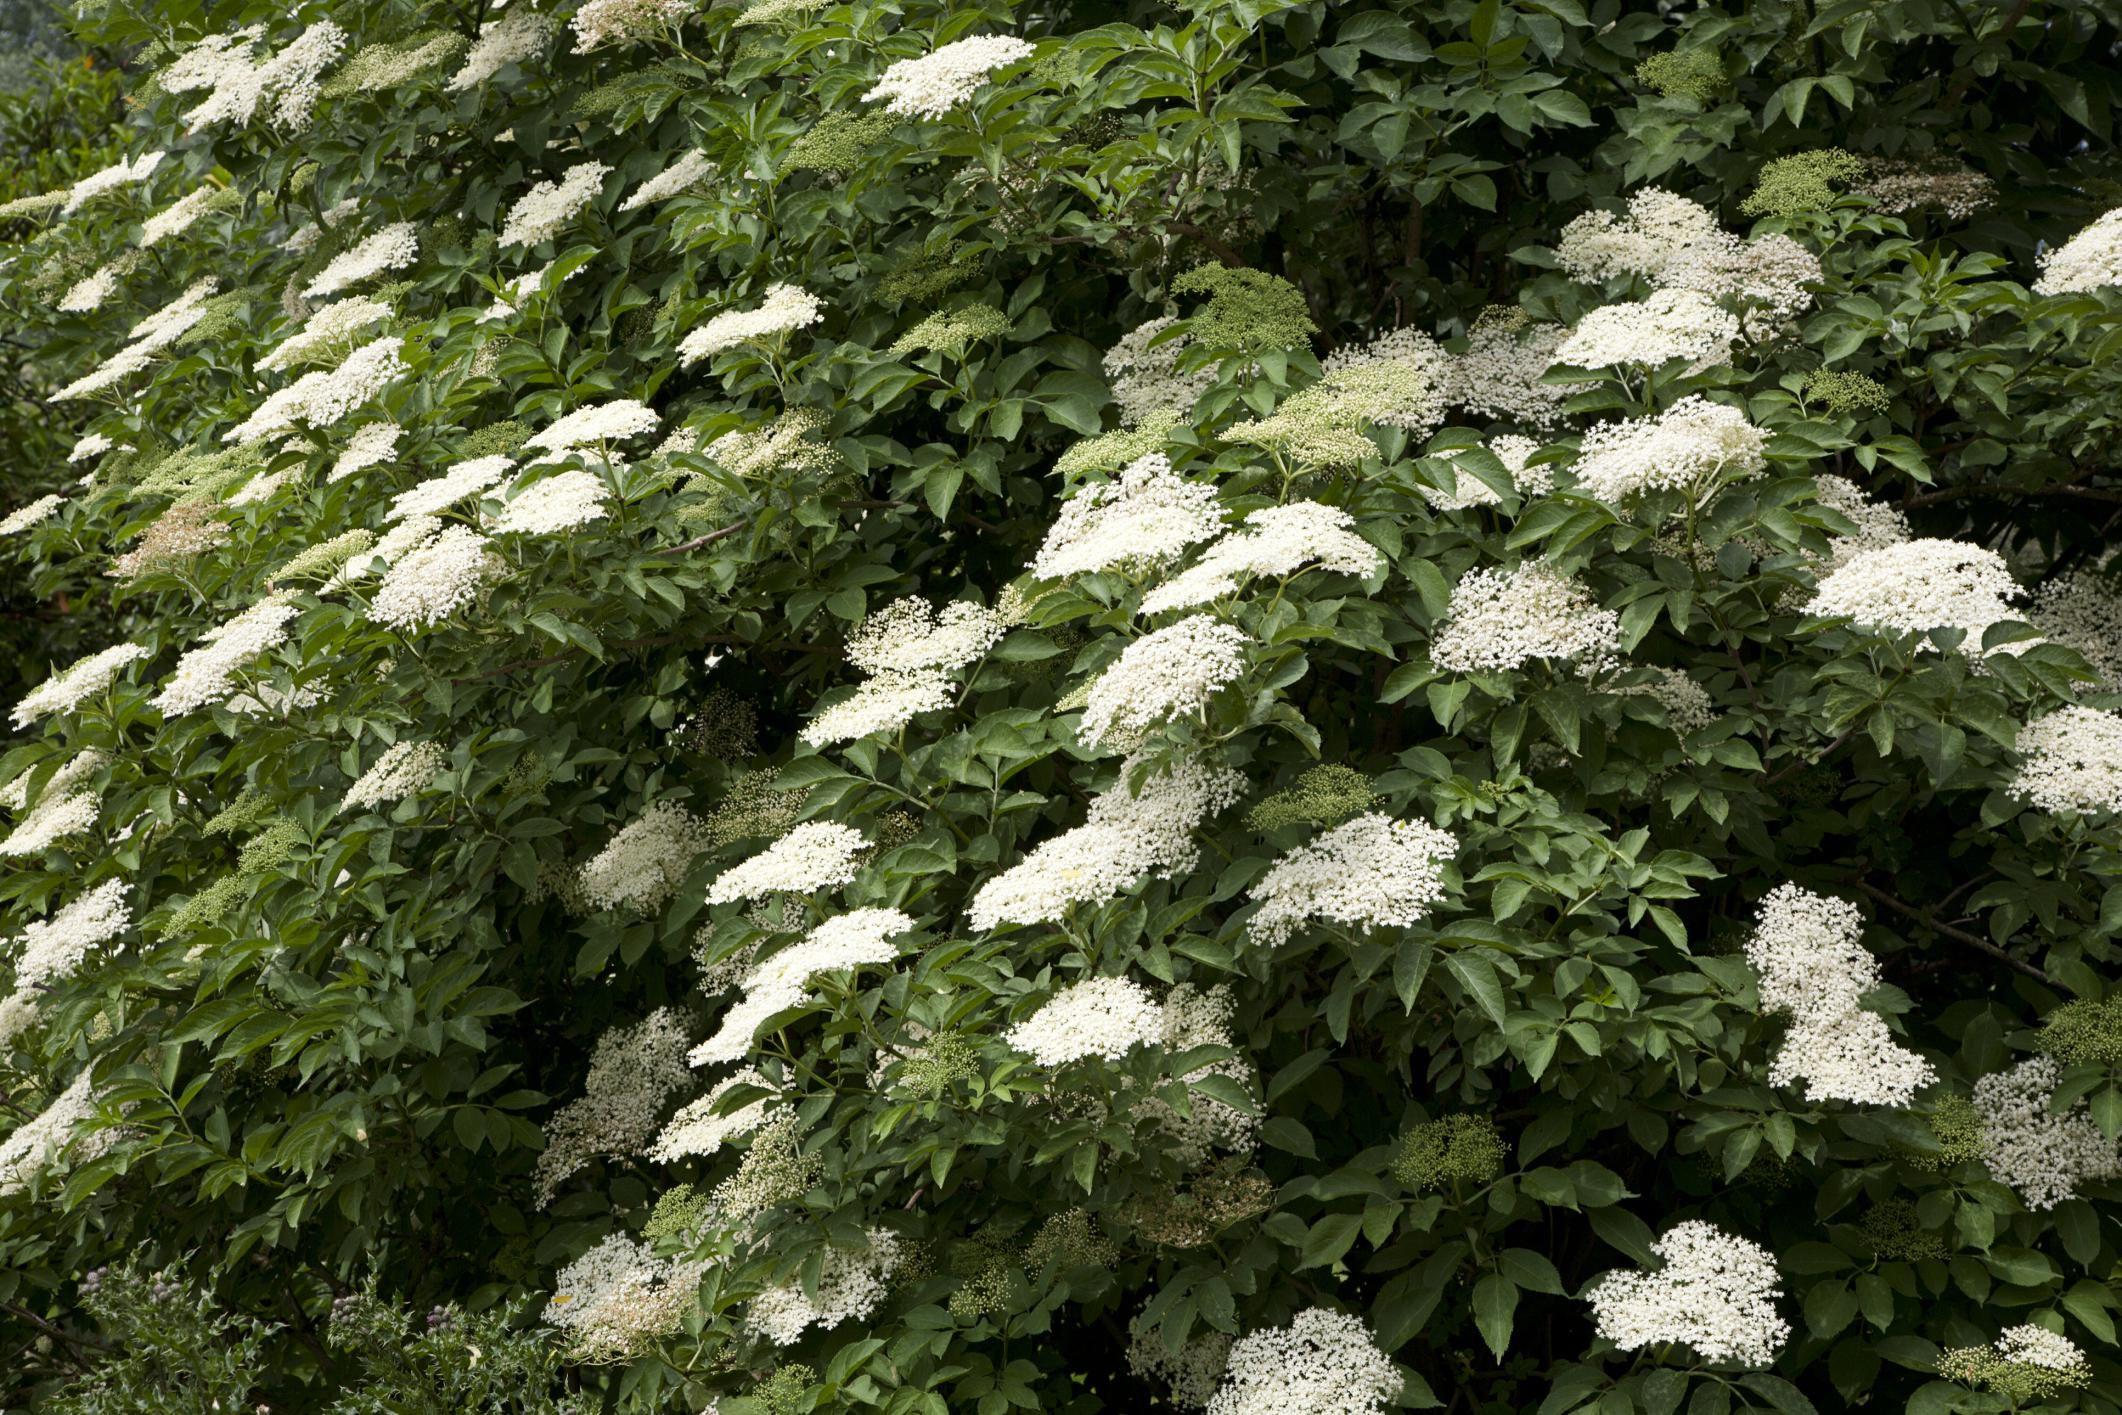 How To Grow The Common Elderberry Shrub